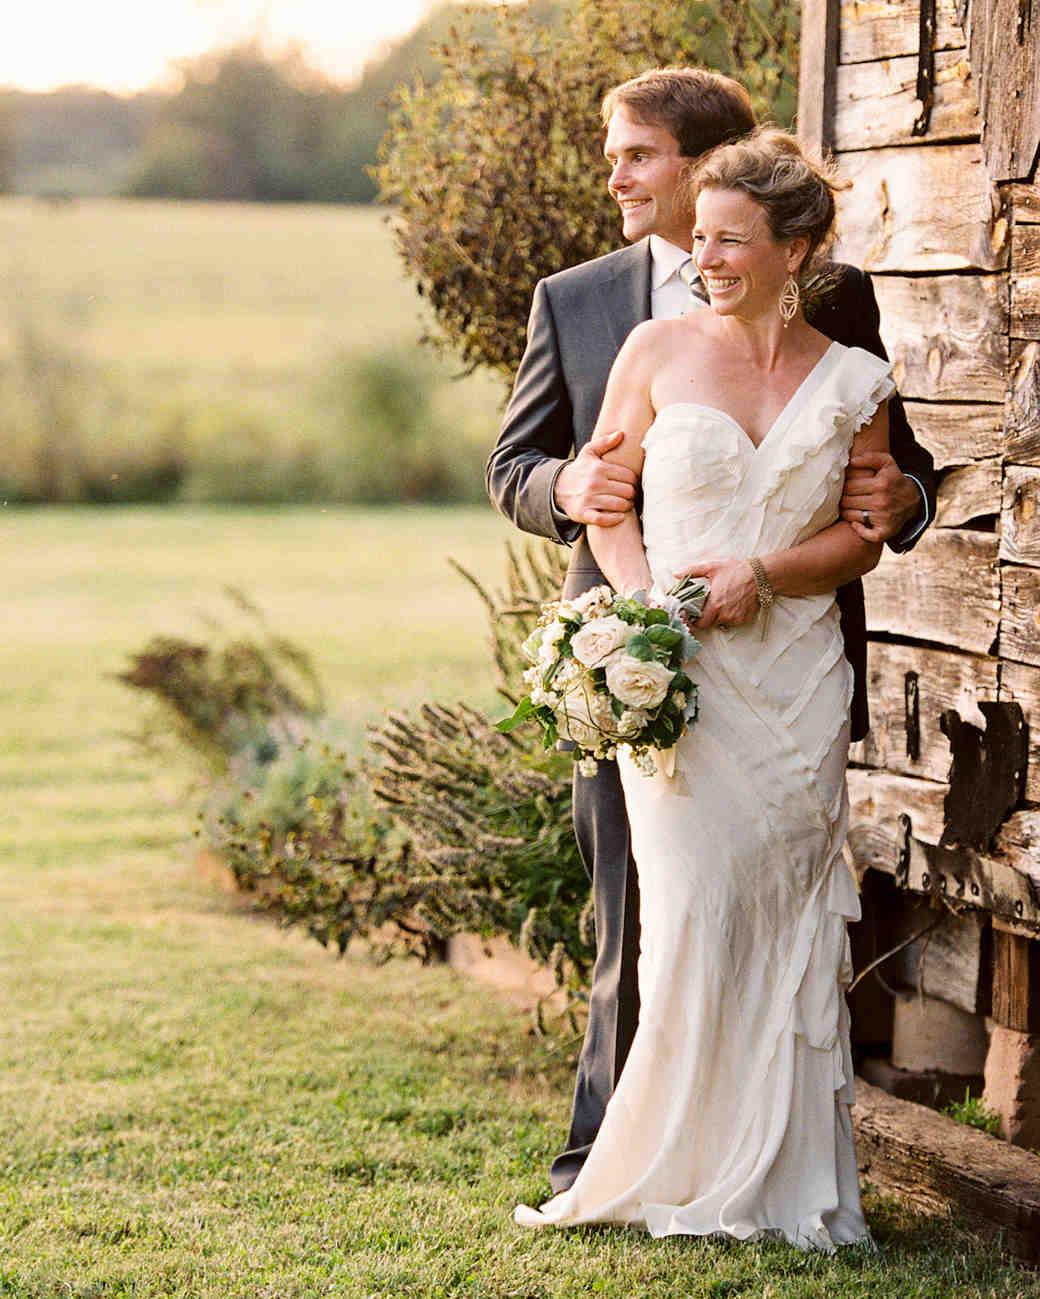 Блейк лайвли фото свадьбы